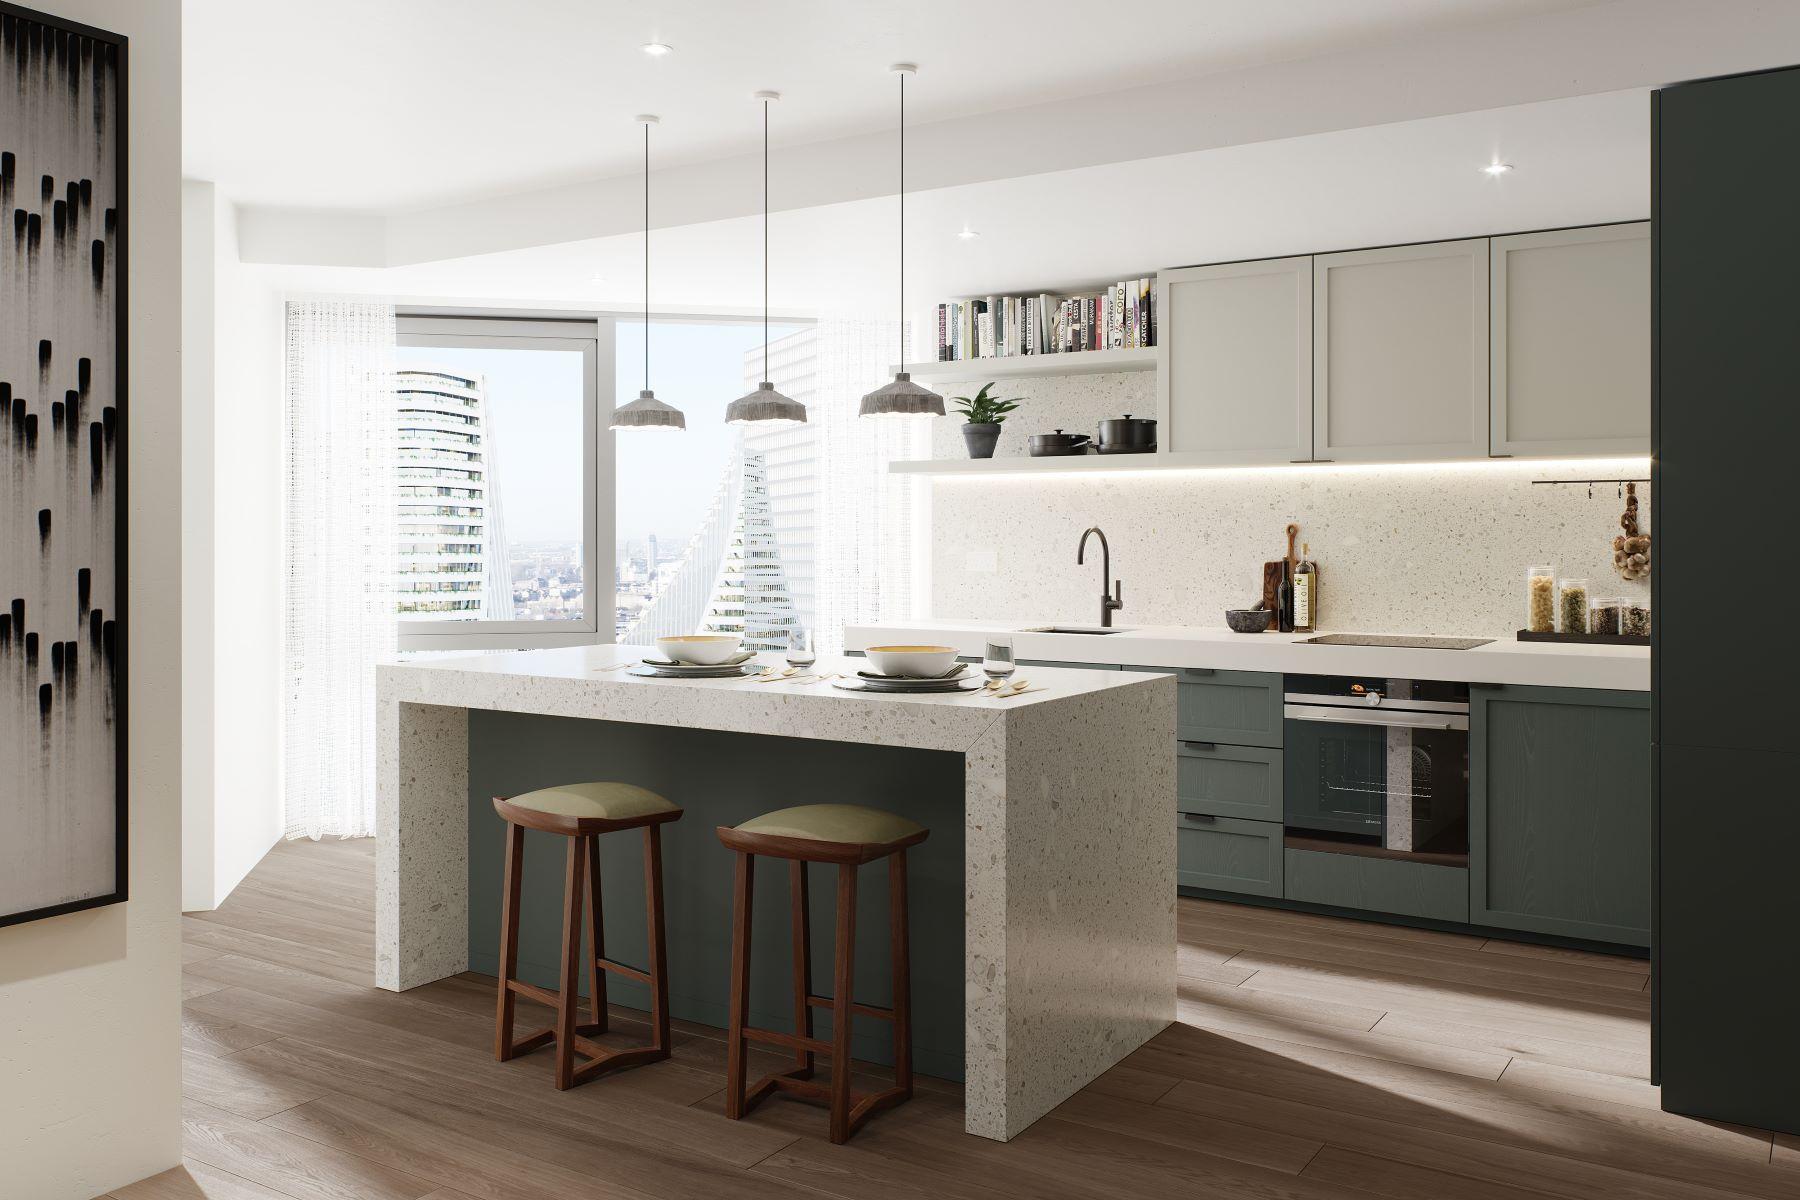 Apartments for Sale at Greenwich Peninsula Building 3 (10.06), Upper Riverside London, England SE10 0SQ United Kingdom